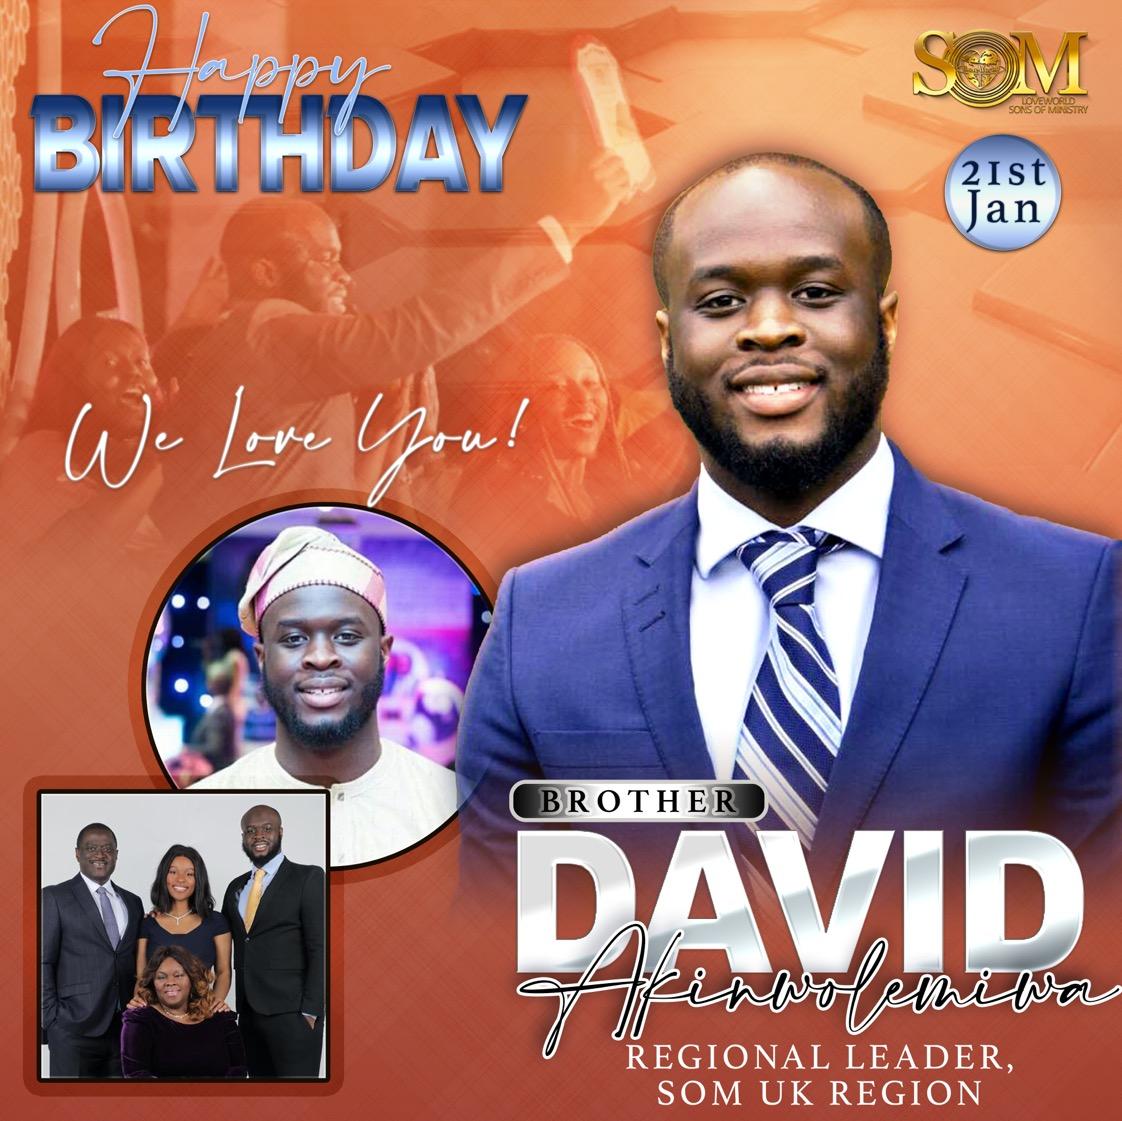 CELEBRATING EXCELLENCE Happy Birthday to